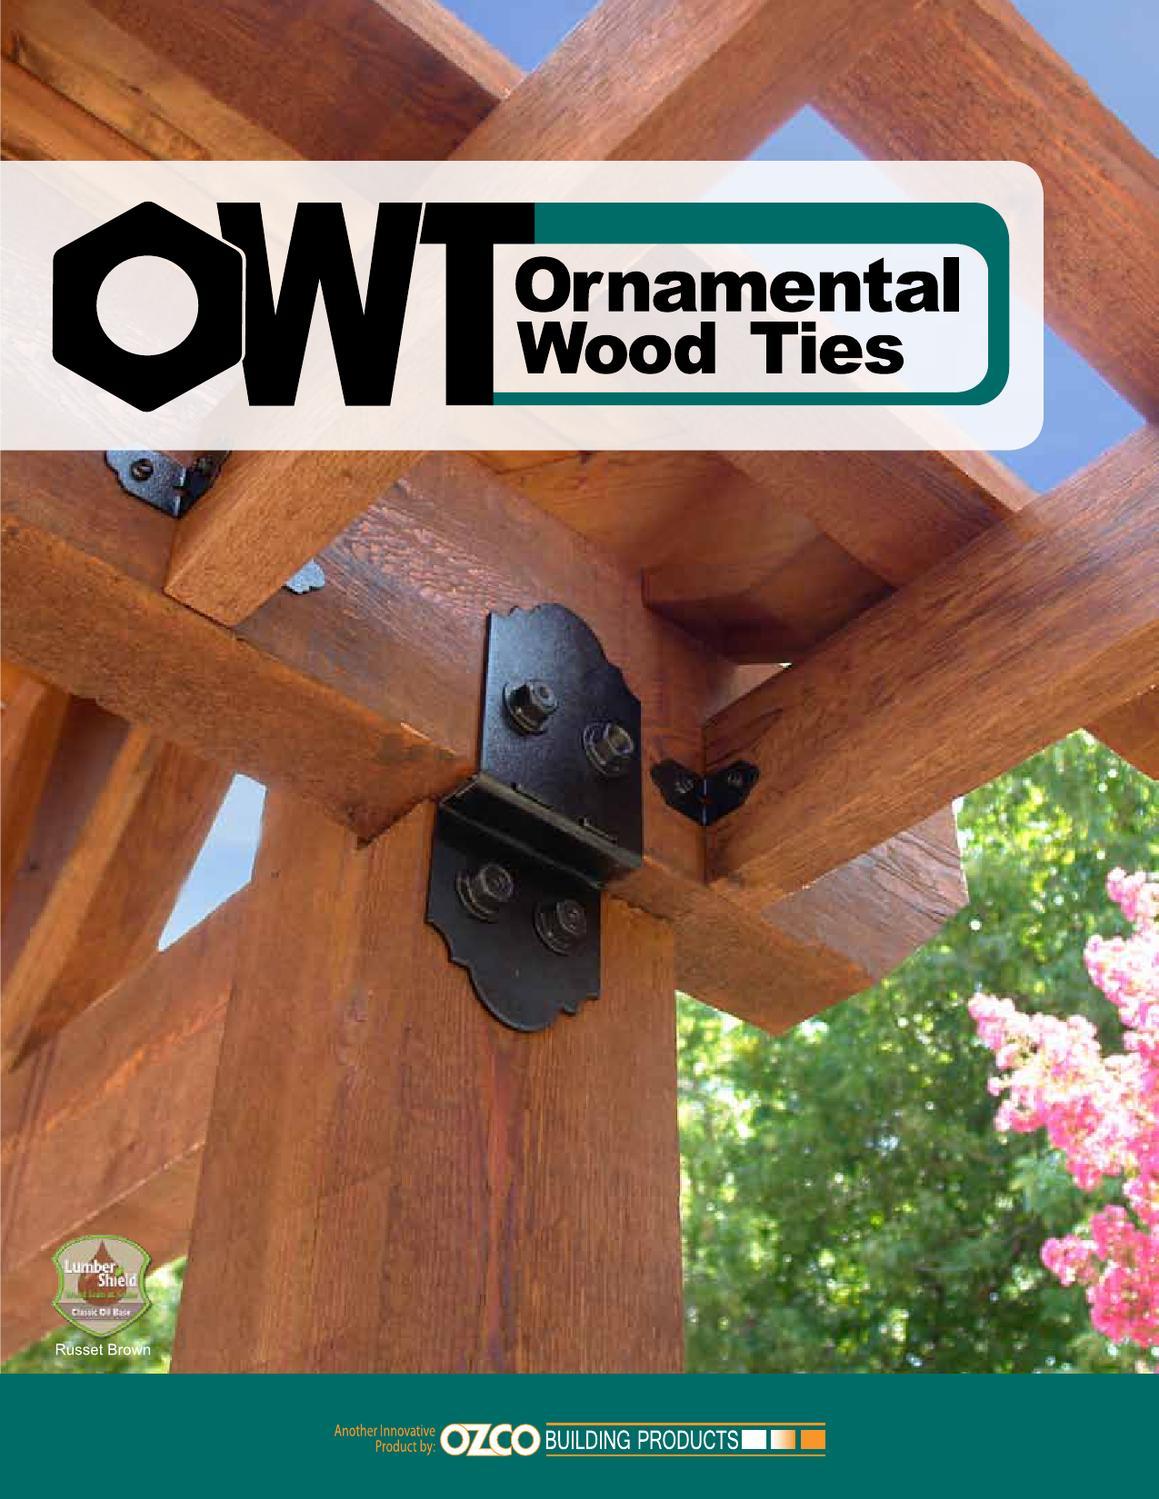 Owt Ornamental Wood Ties Catalog 2013 By Ozco Building